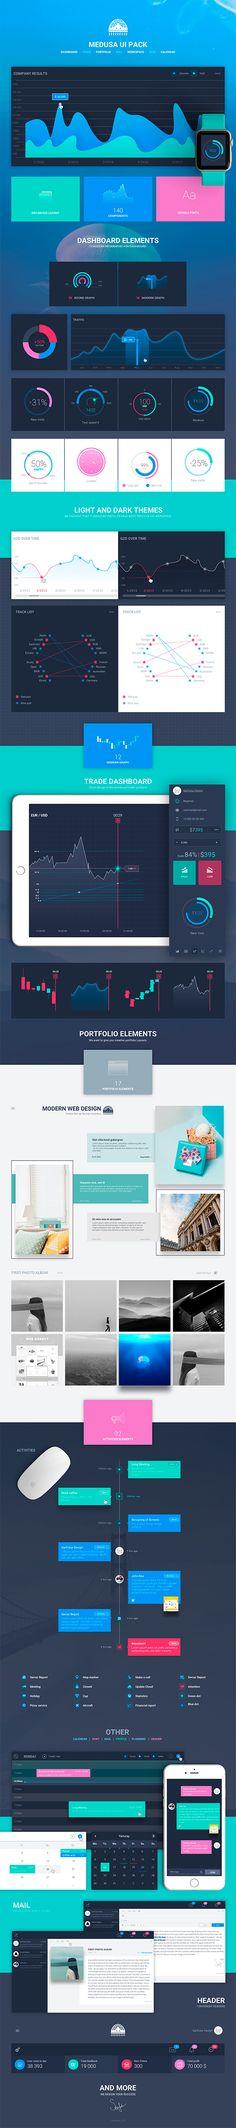 Download Free              Medusa UI Kit            #               chart #colorful #dark #dashboard #ios10 #kit #layout #material #modern #portfolio #trade #ui #ux #web